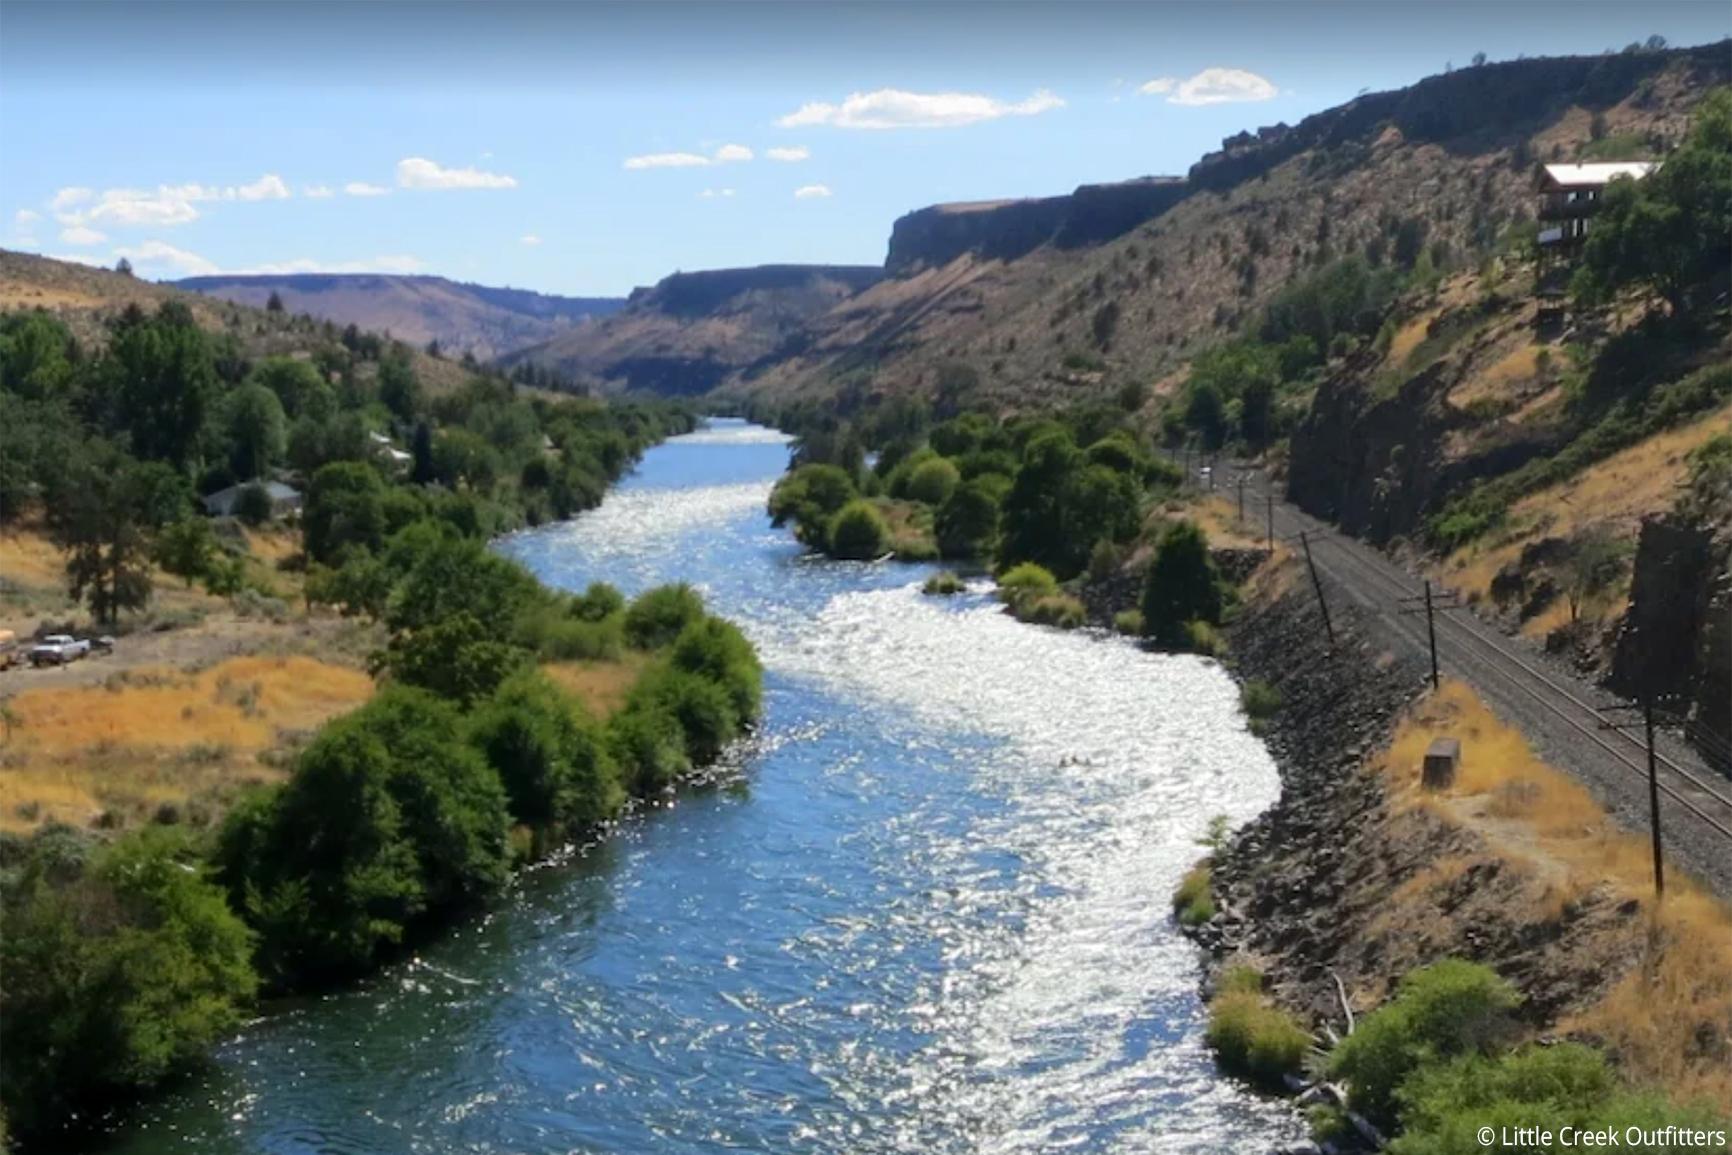 View From Deschutes River Bridge